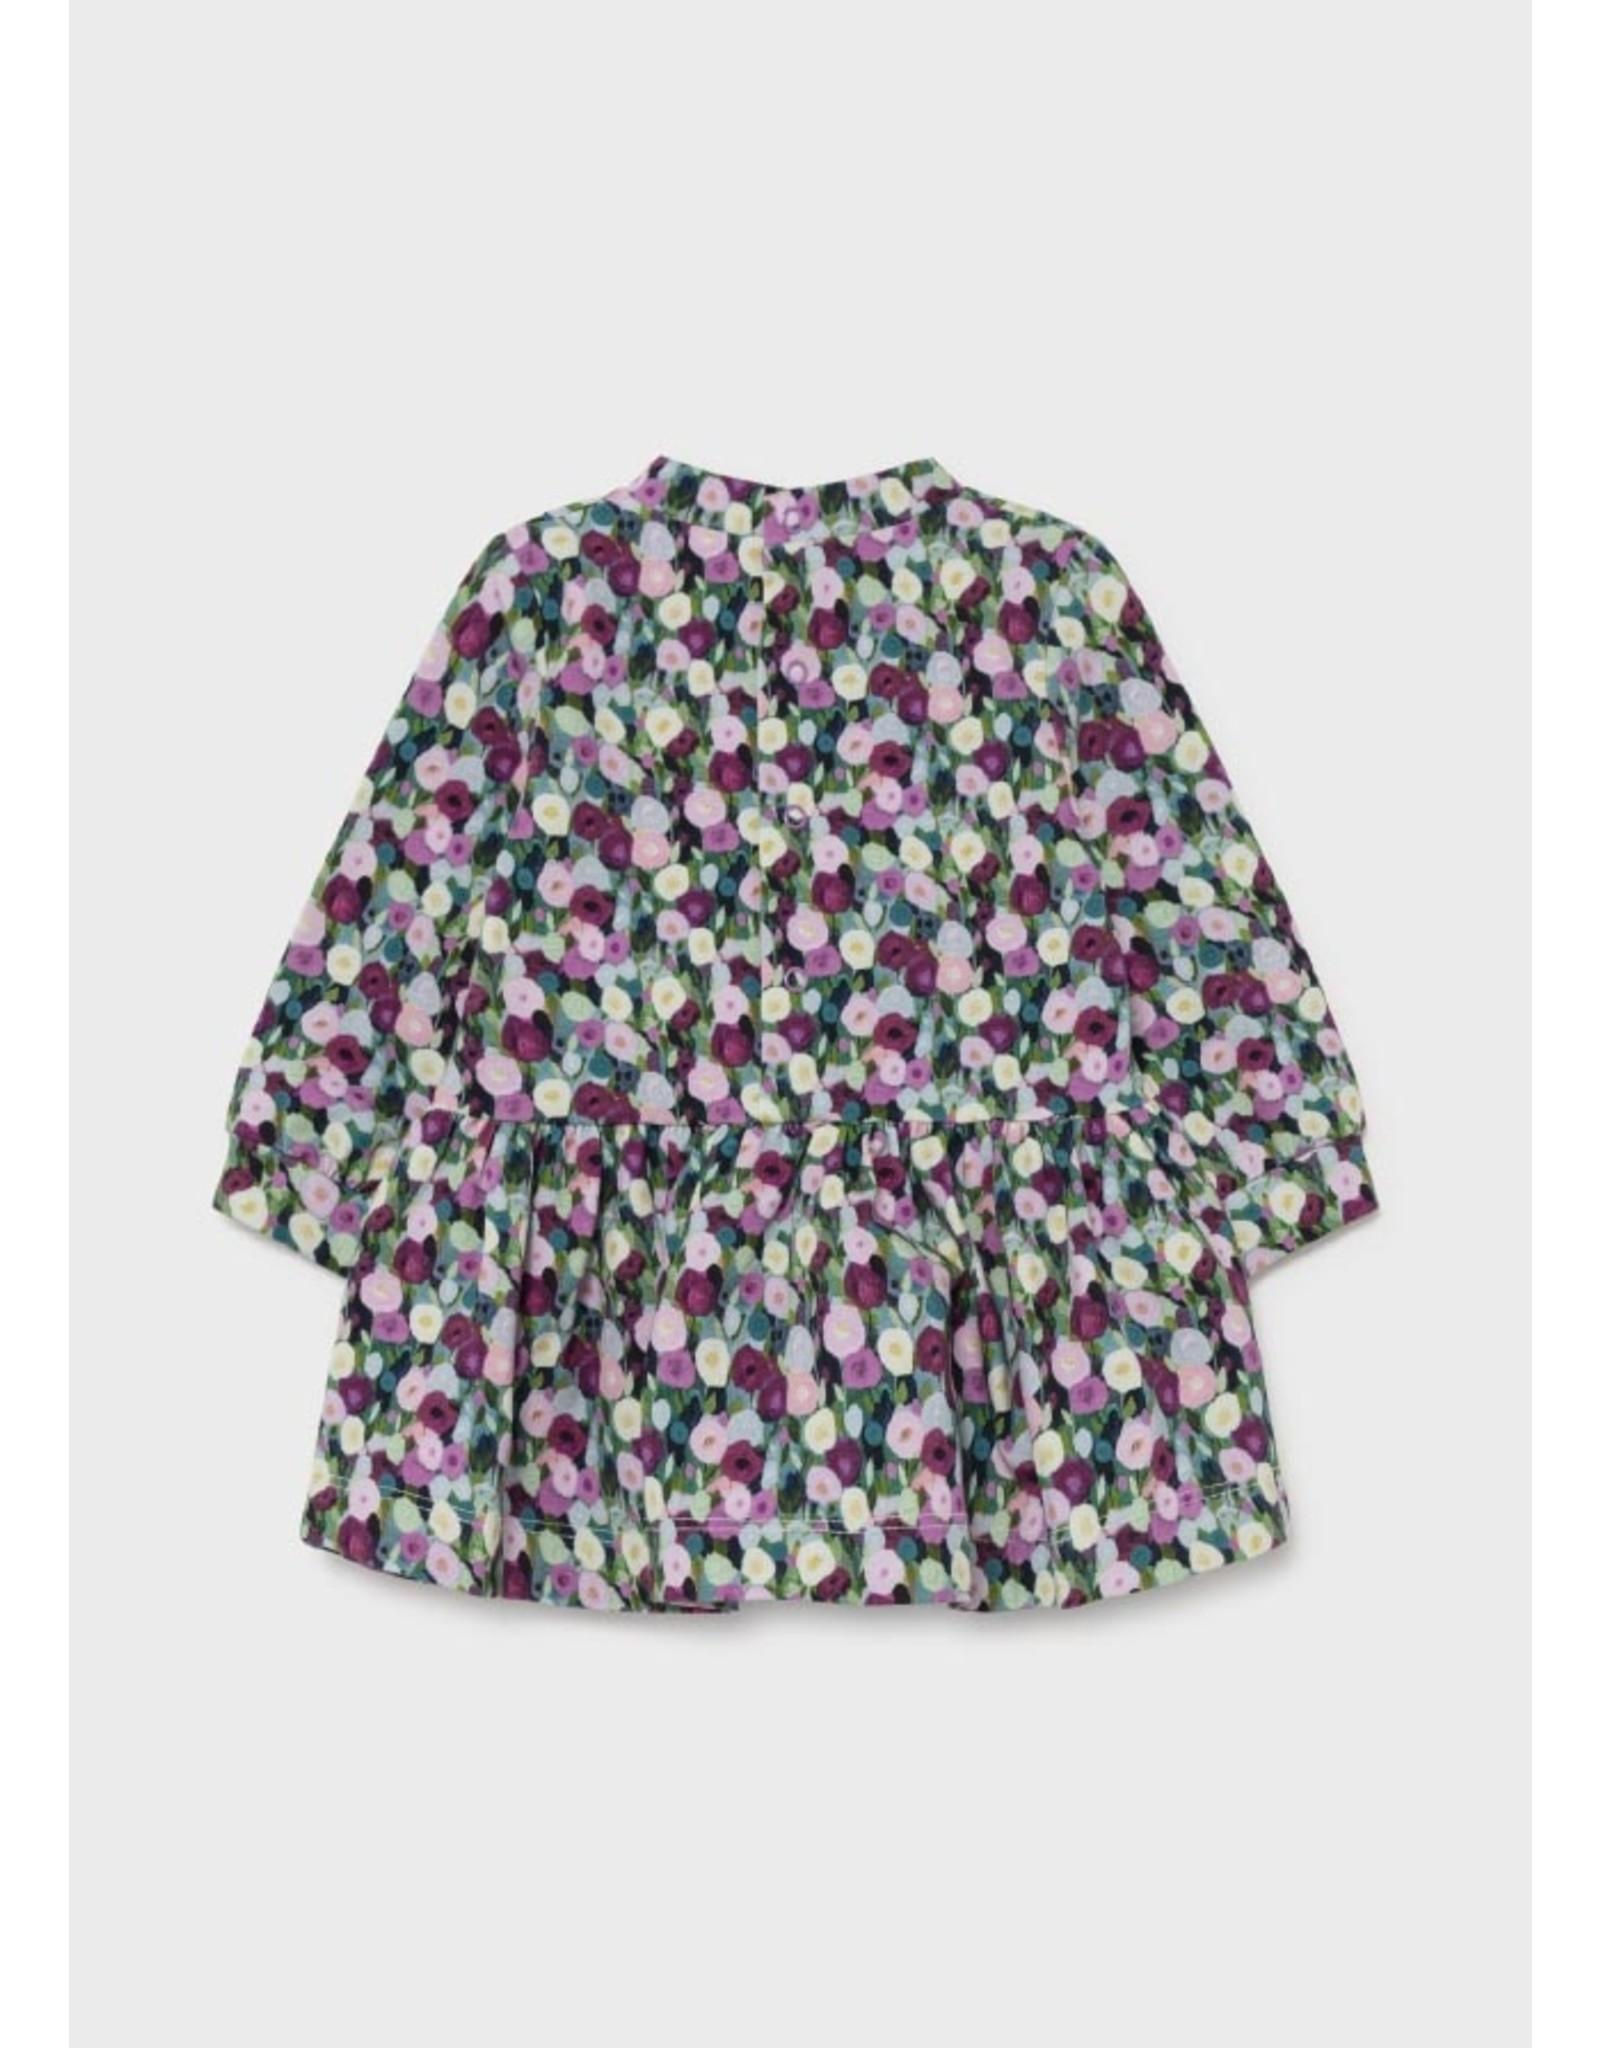 Mayoral Fleece Dress in Mauve Poppy